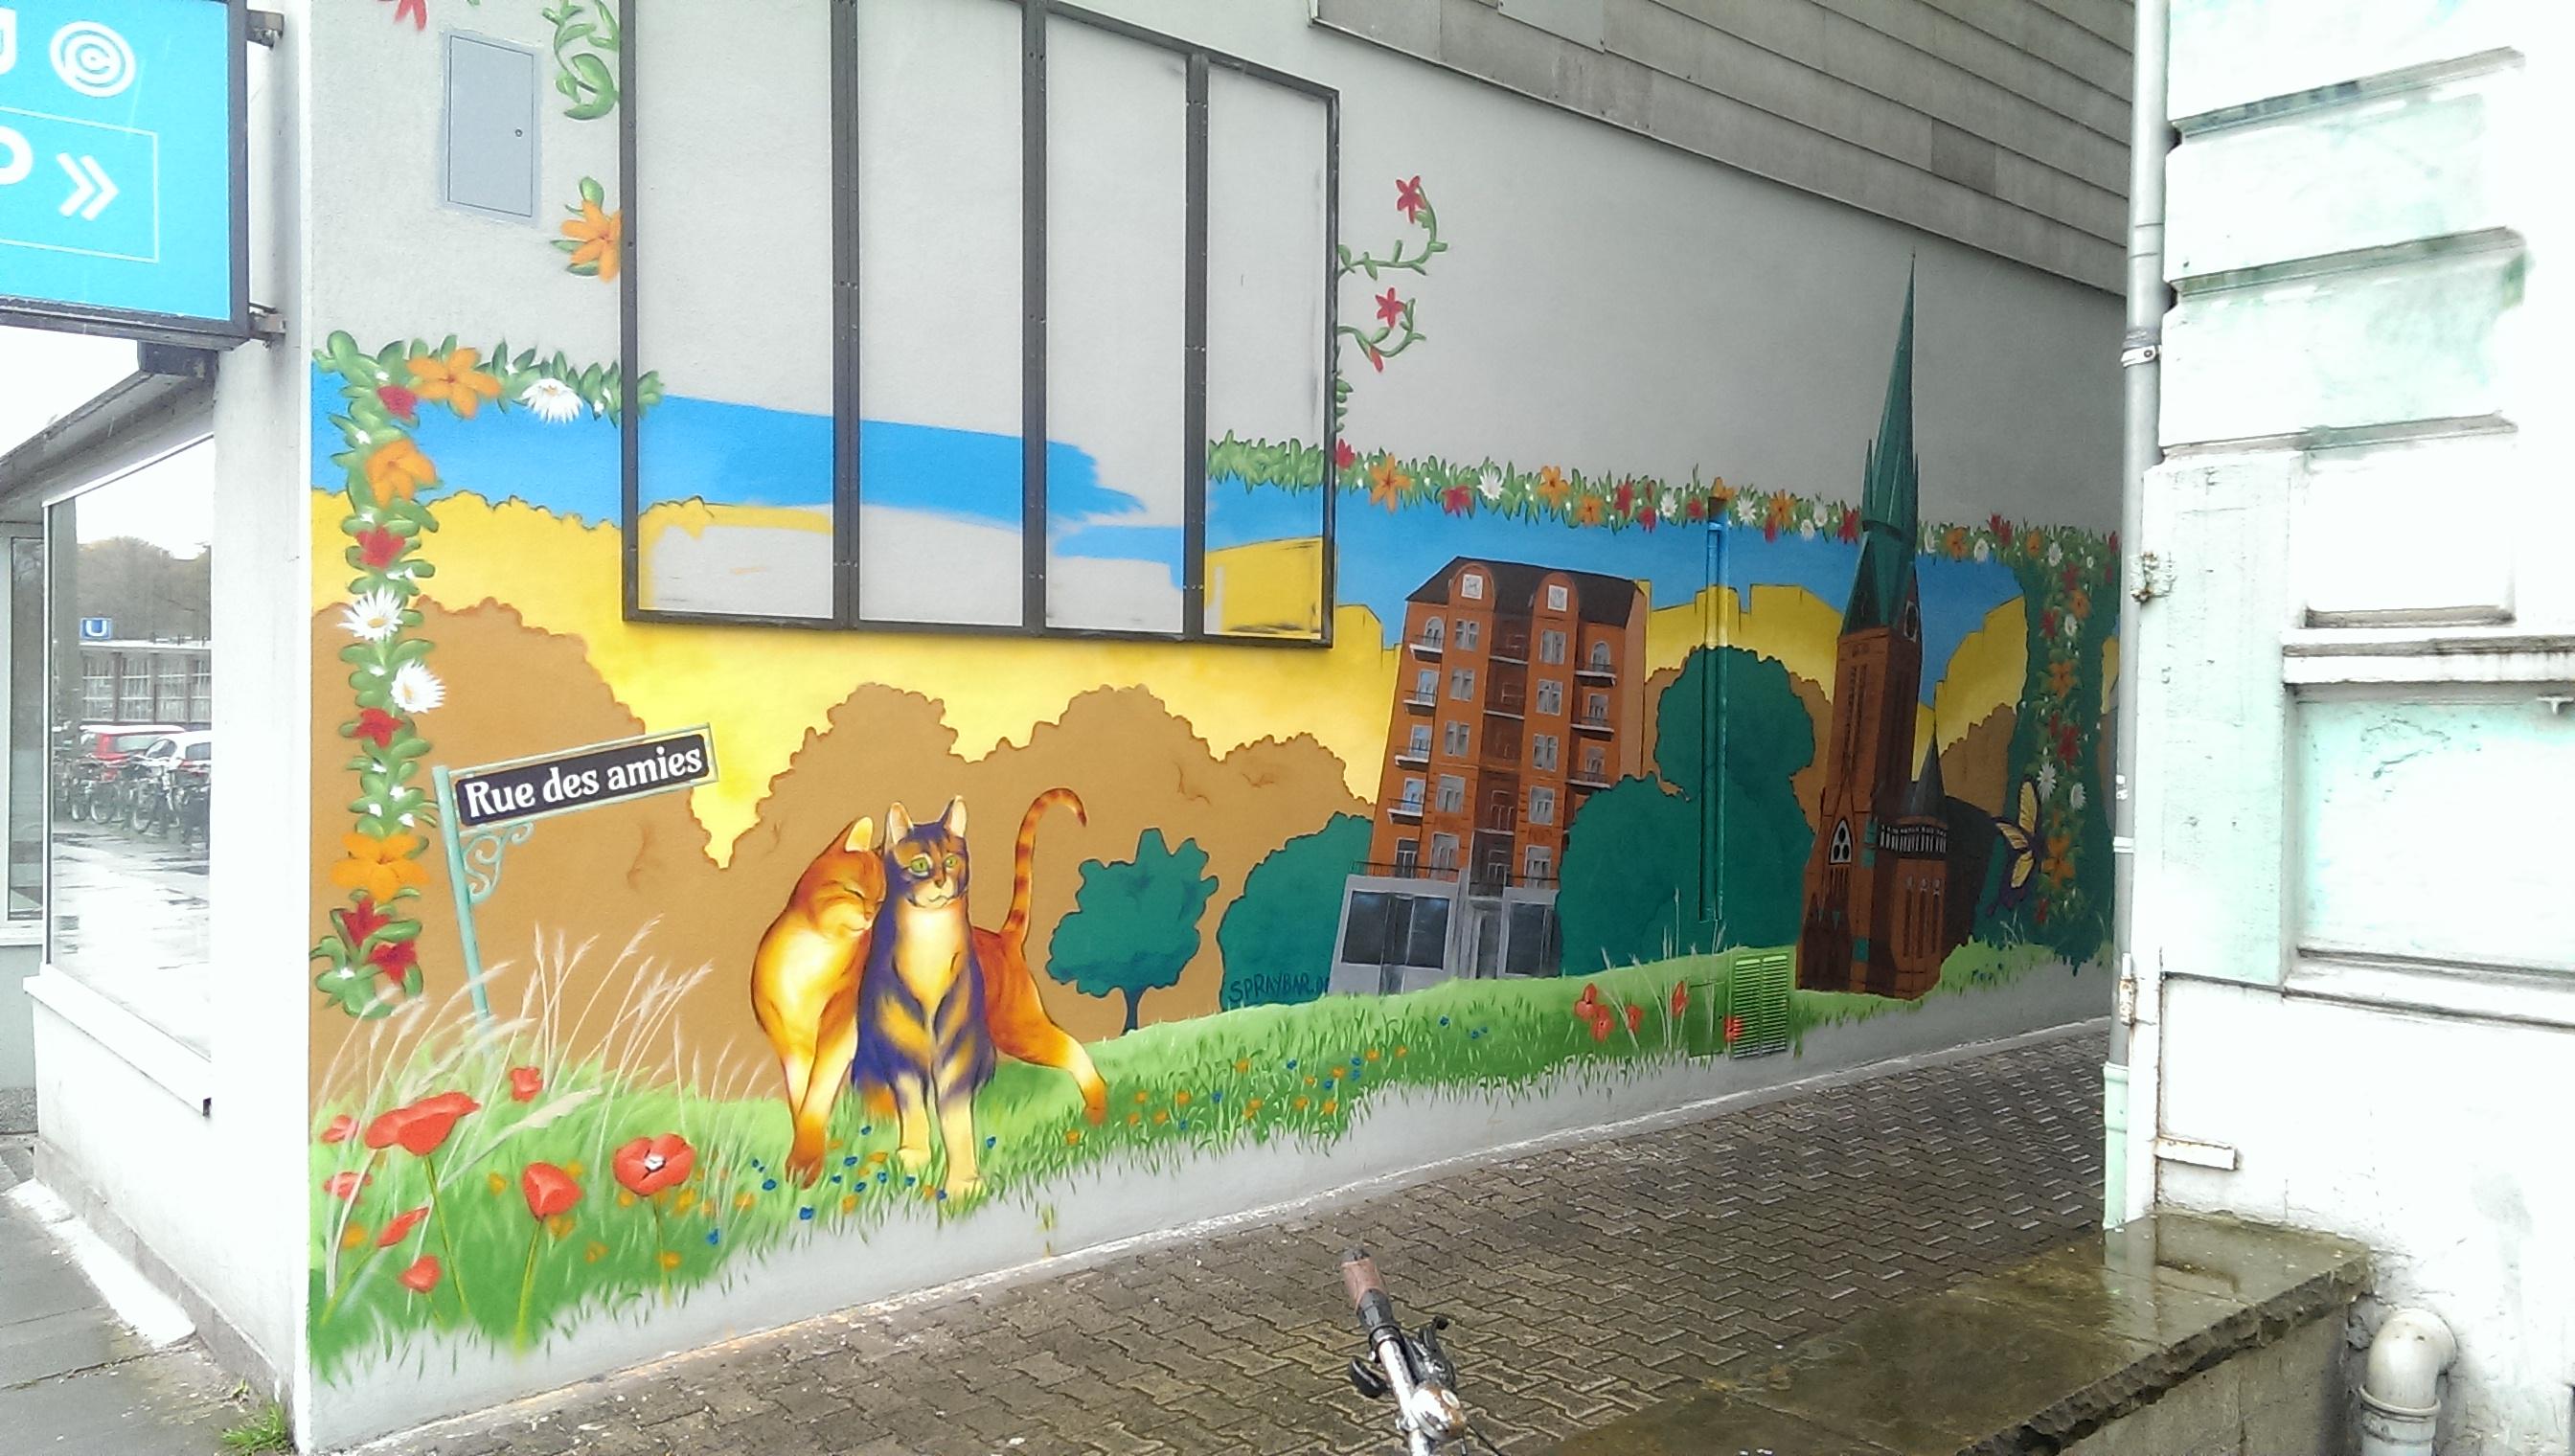 Hamburg Fruchtallee Graffiti_1